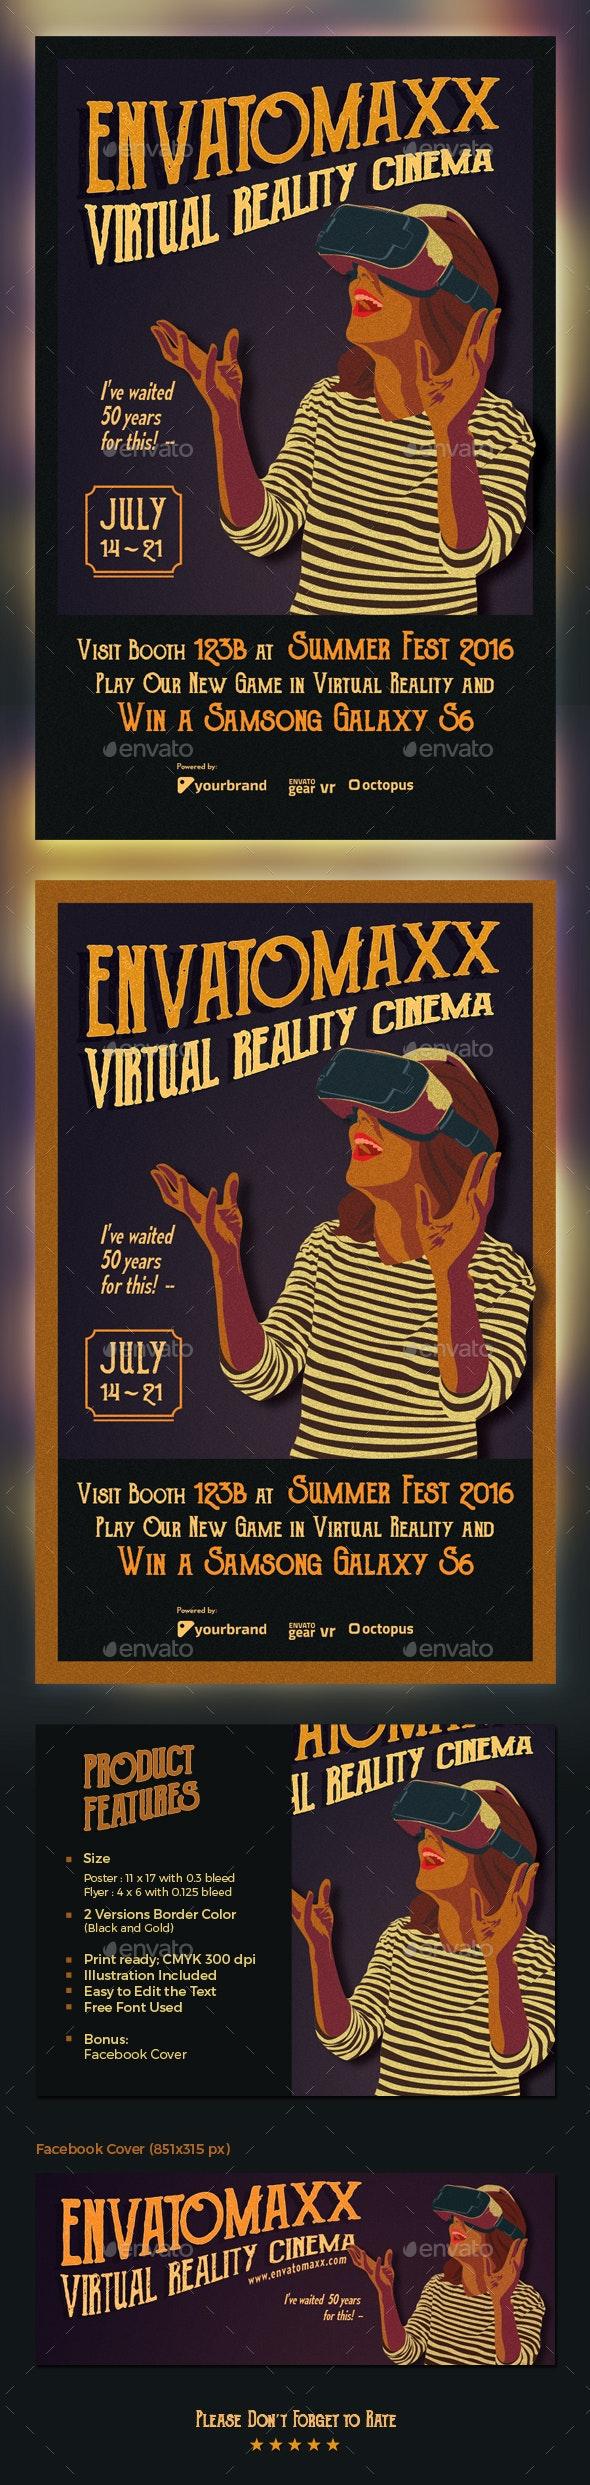 Vintage Virtual Reality Cinema Flyer - Events Flyers